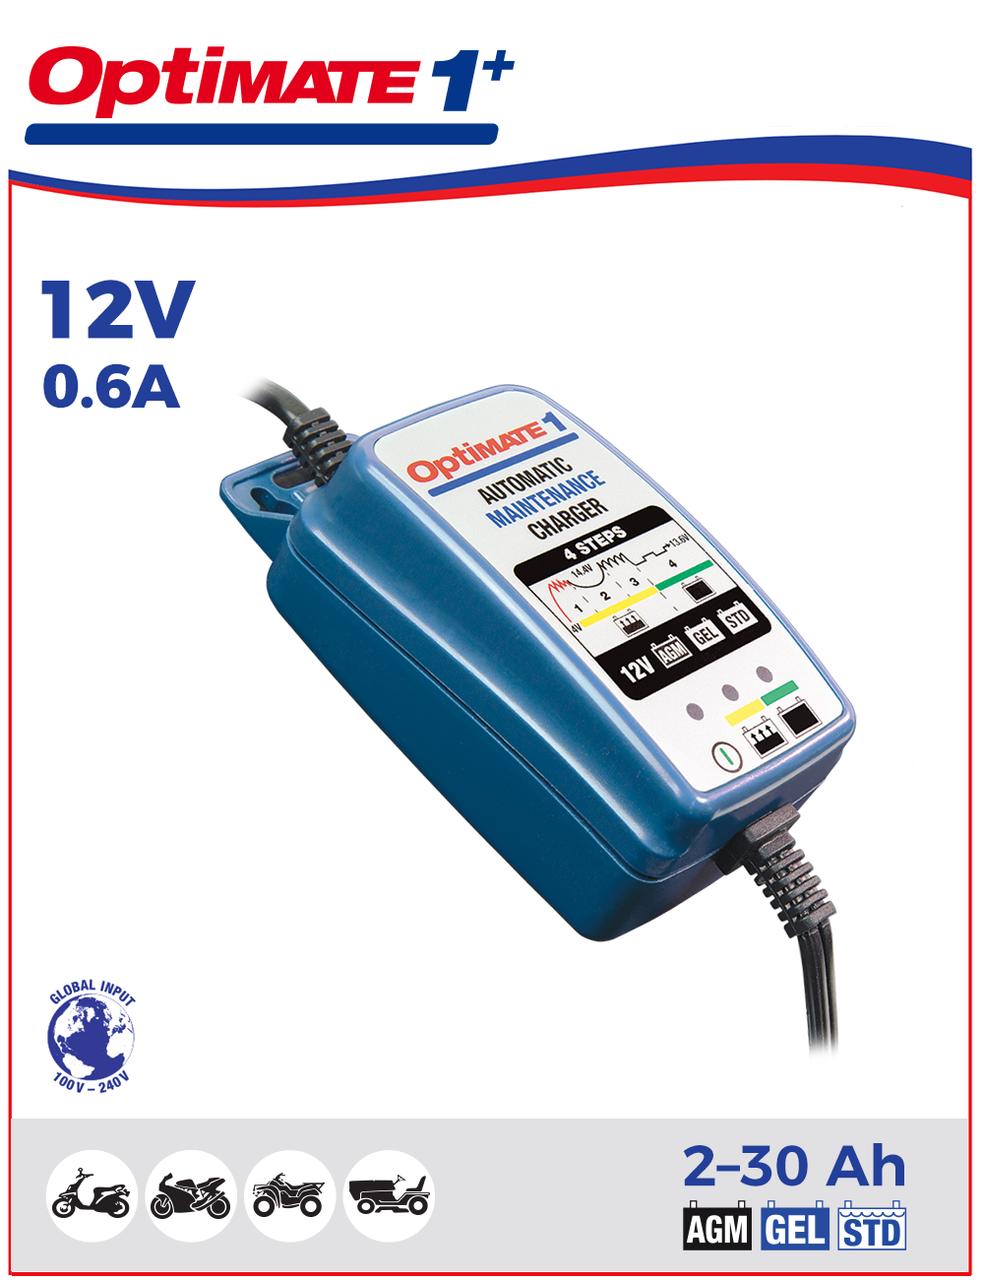 Зарядное устройство Optimate 1+ TM402 (1x0,6A, 12V)